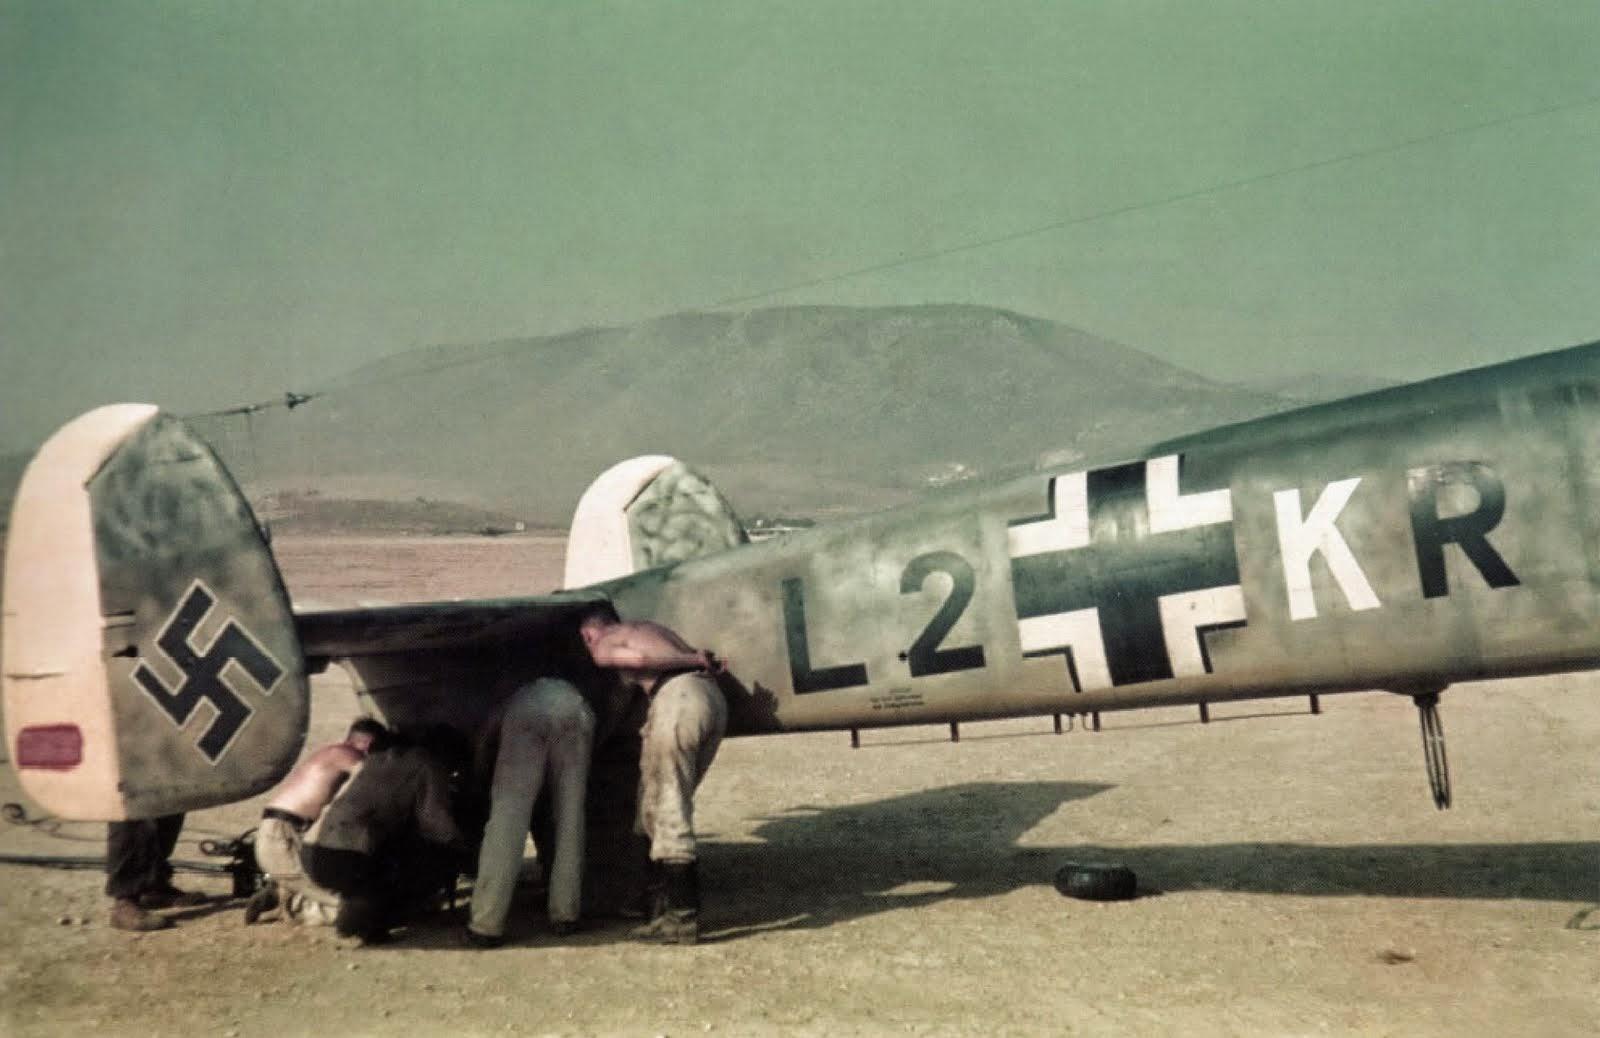 Pzl Jumping A Ju88 World War Ii And Korea Aircraft T